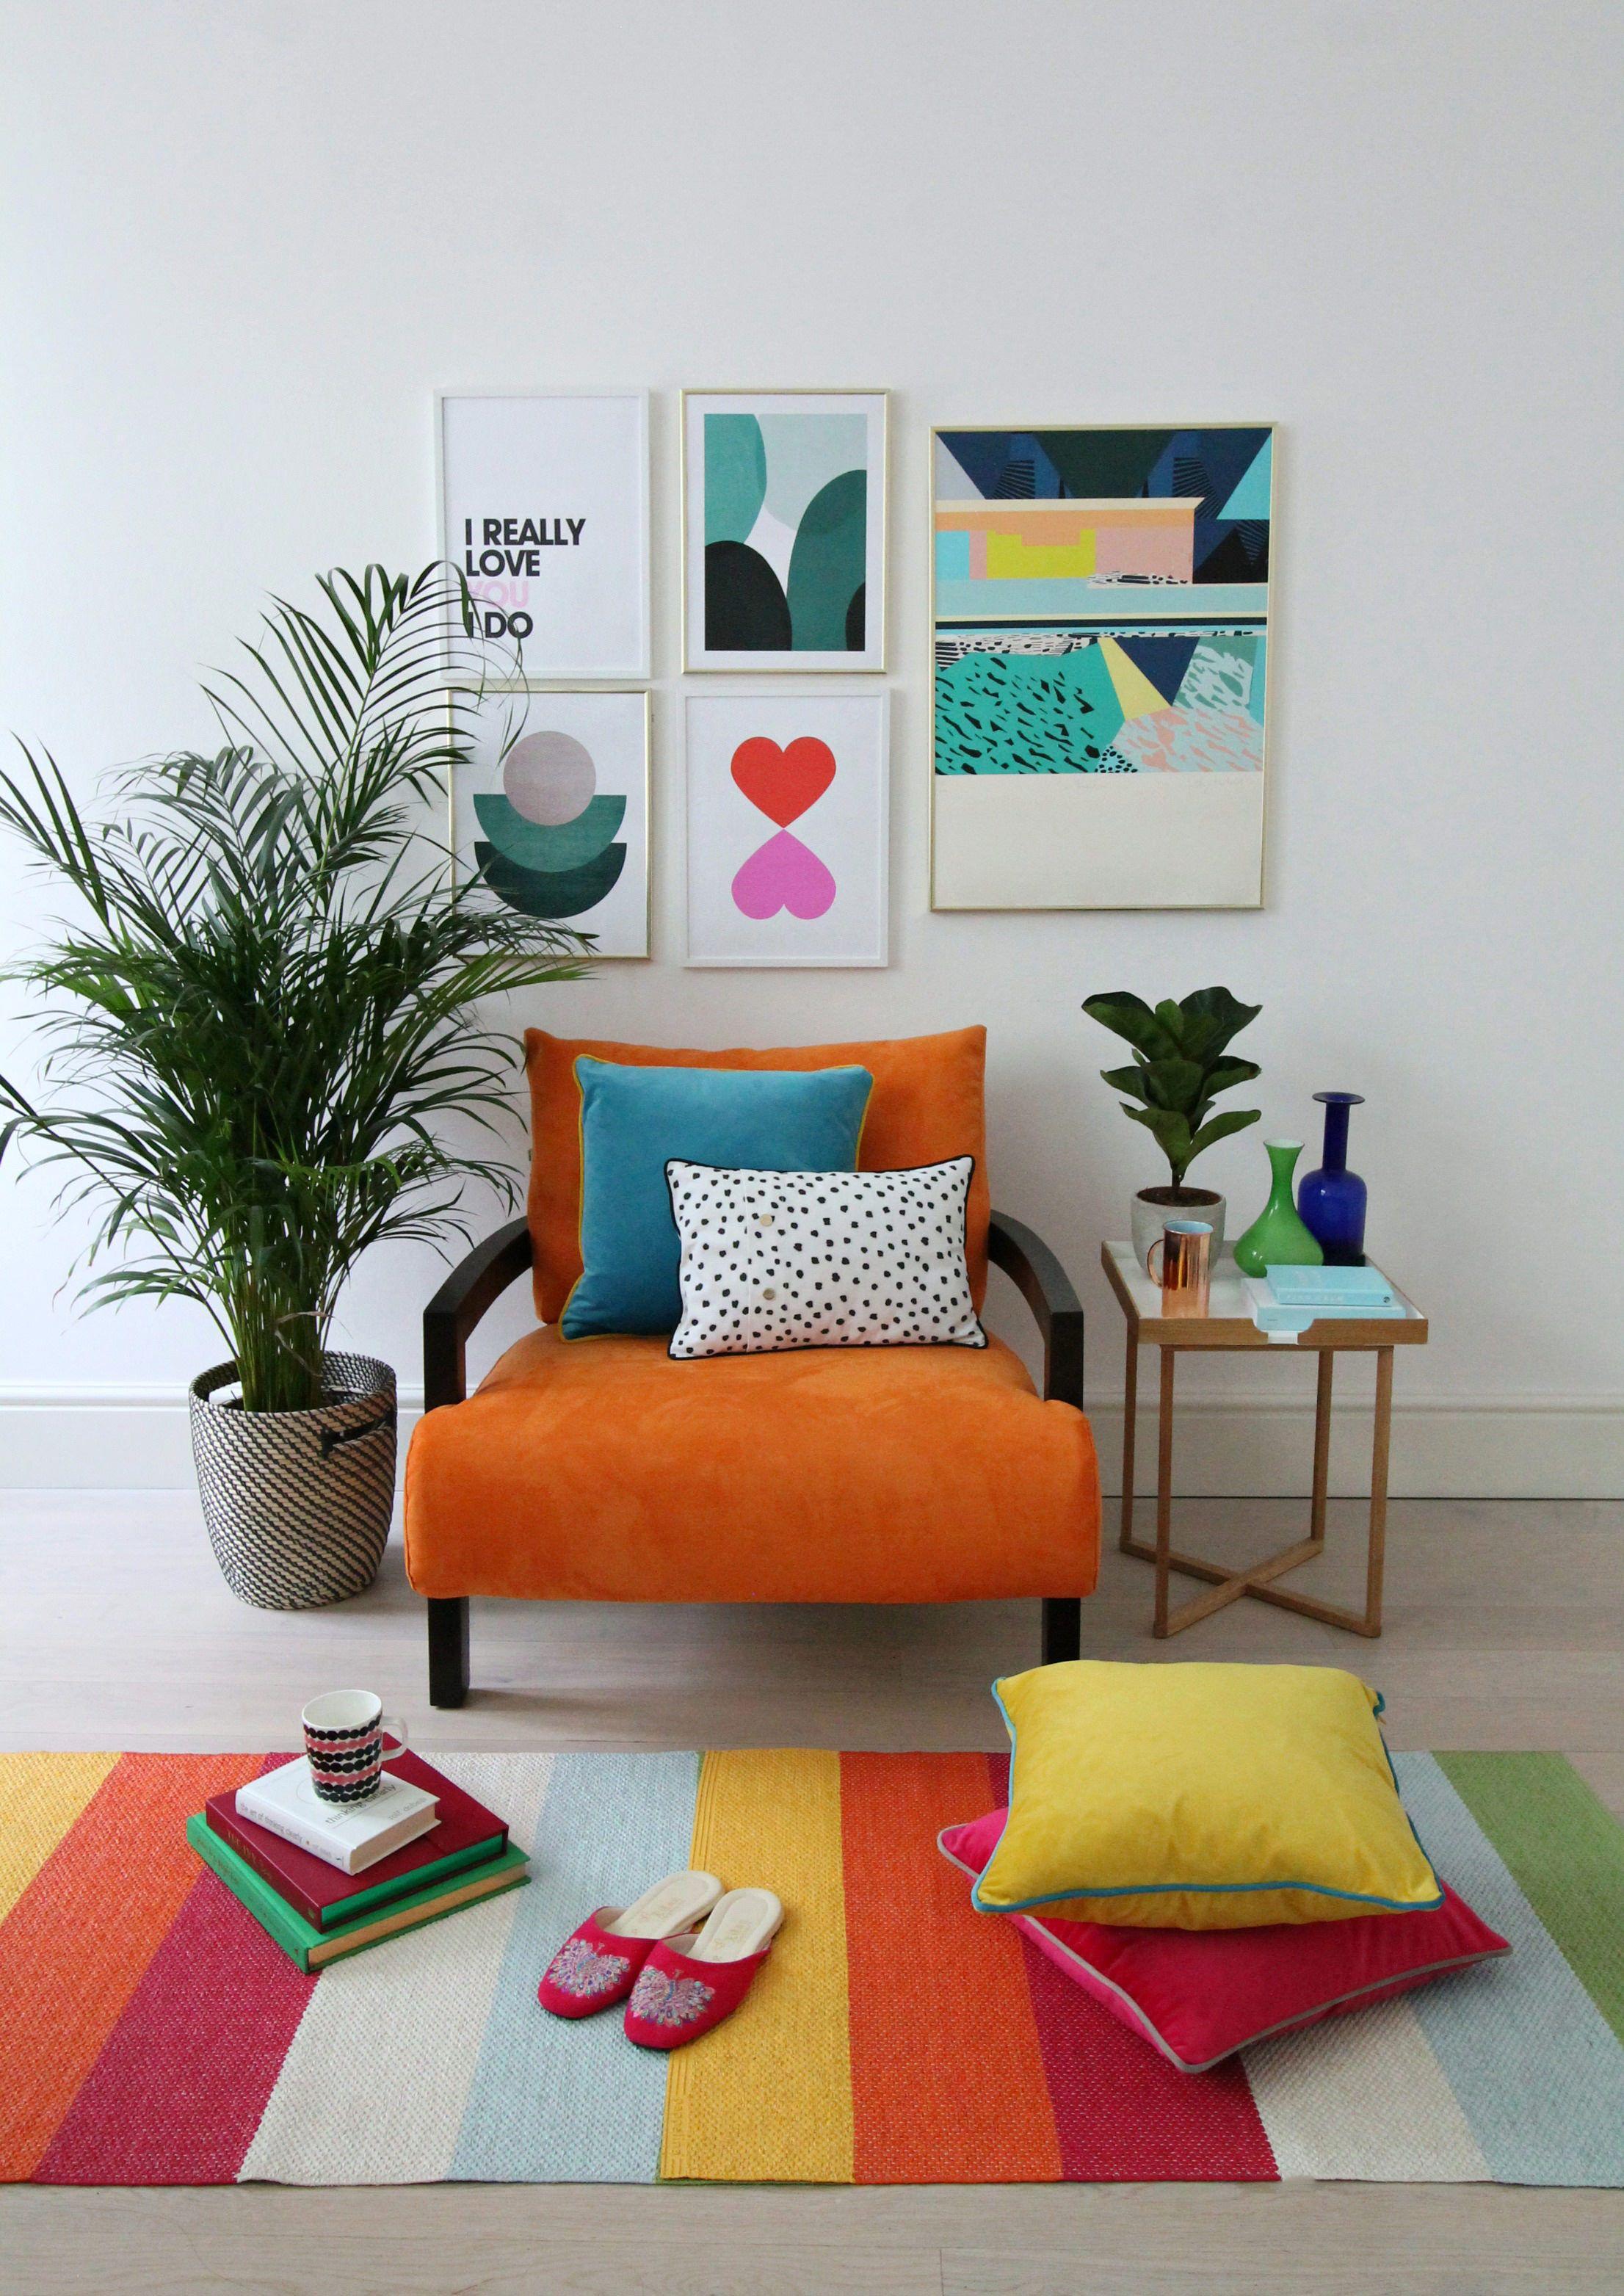 Orange Sofa Novita Swing Chair From Furniture Village Home Decor Colourful Living Room Decor